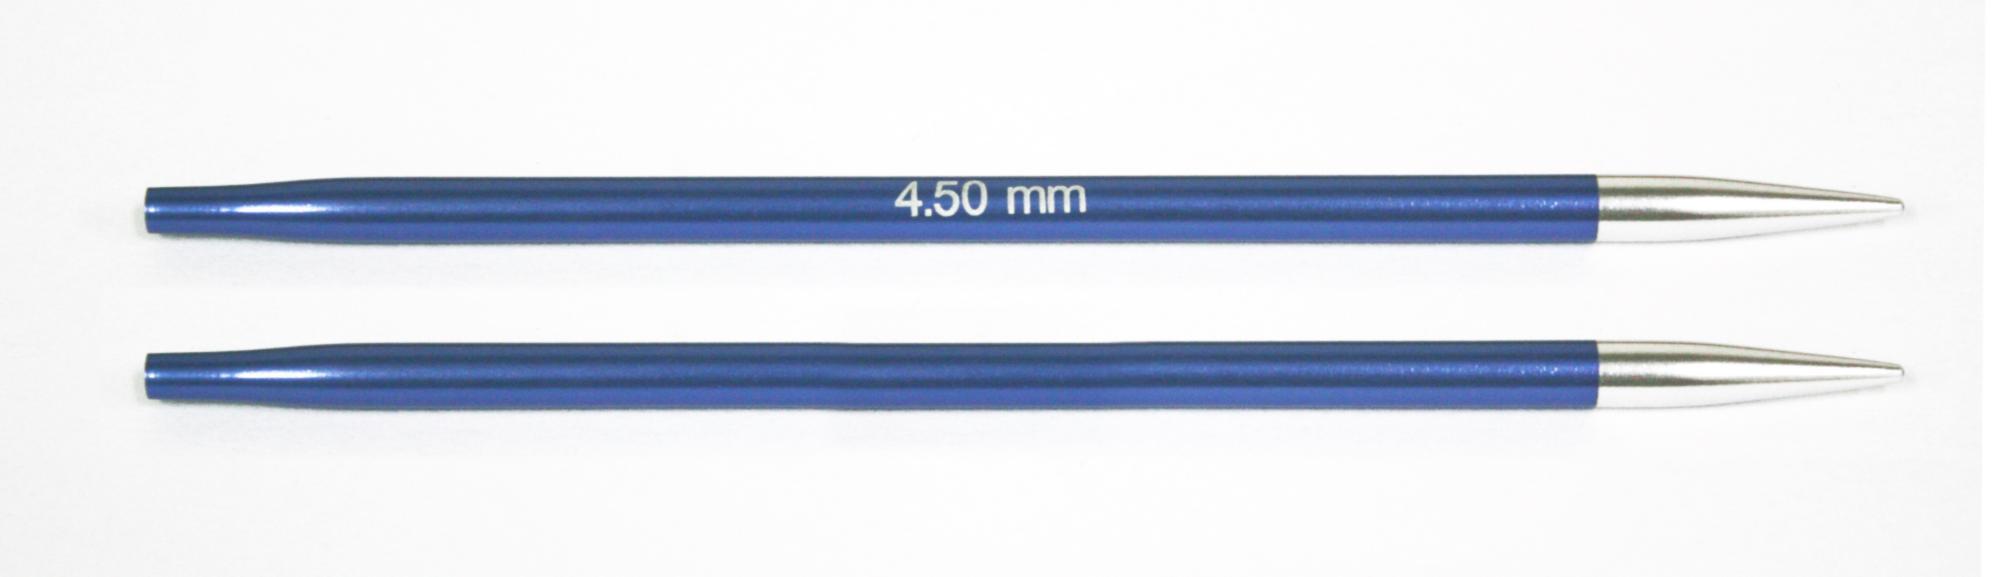 Спицы съемные Zing KnitPro, 47504, 4.50 мм